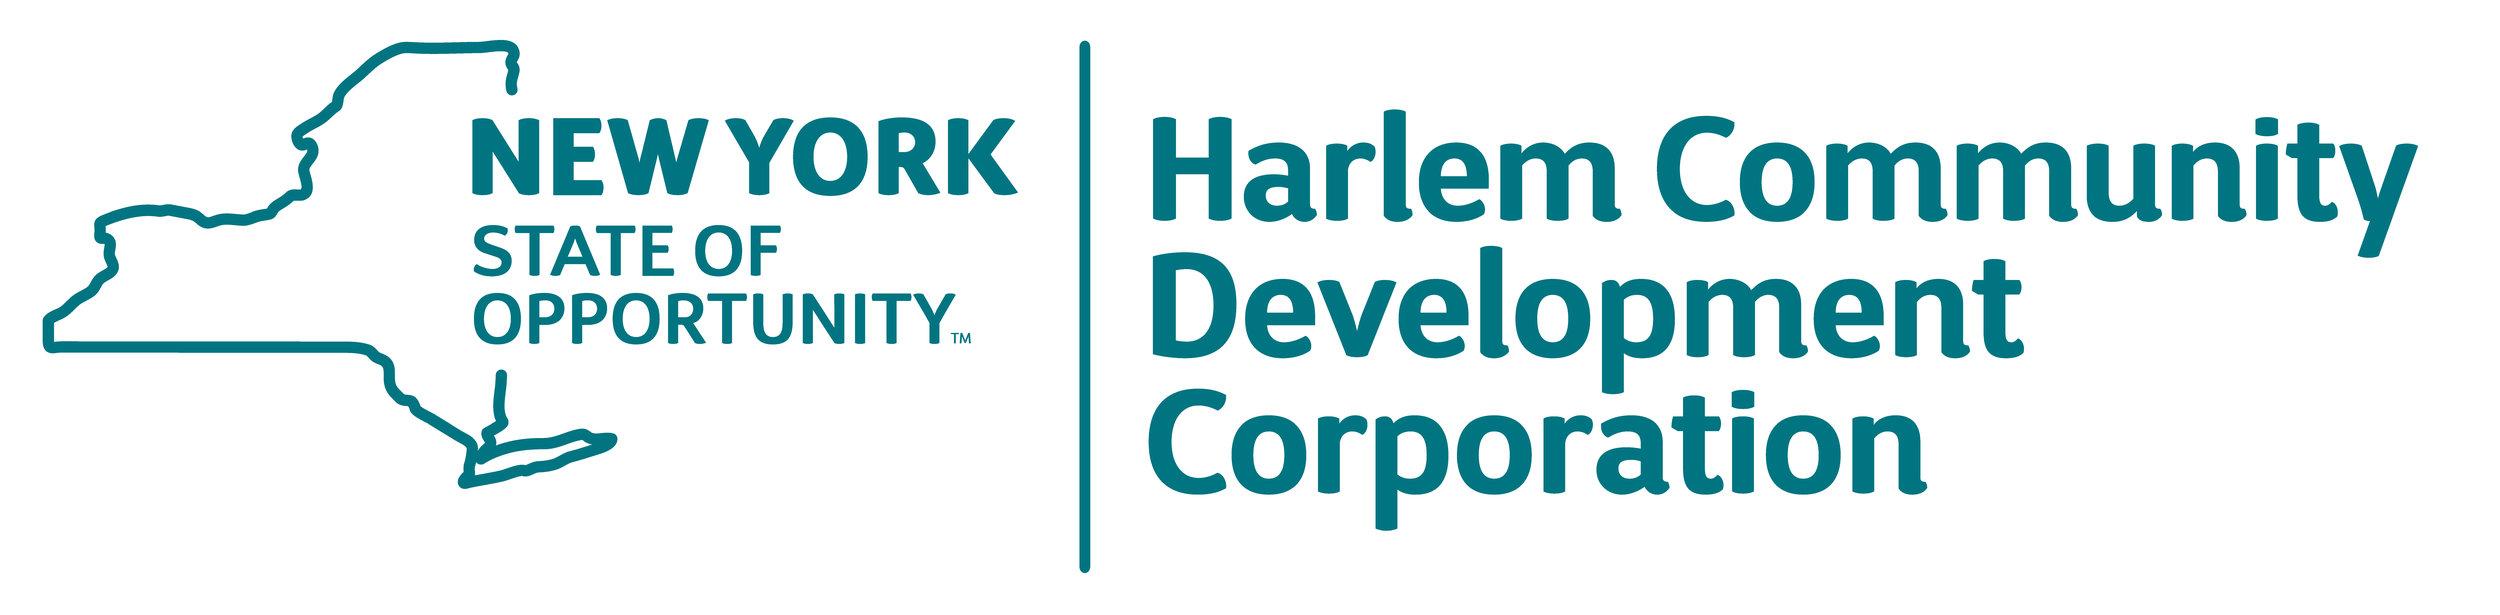 Harlem-Community-Development-Corp